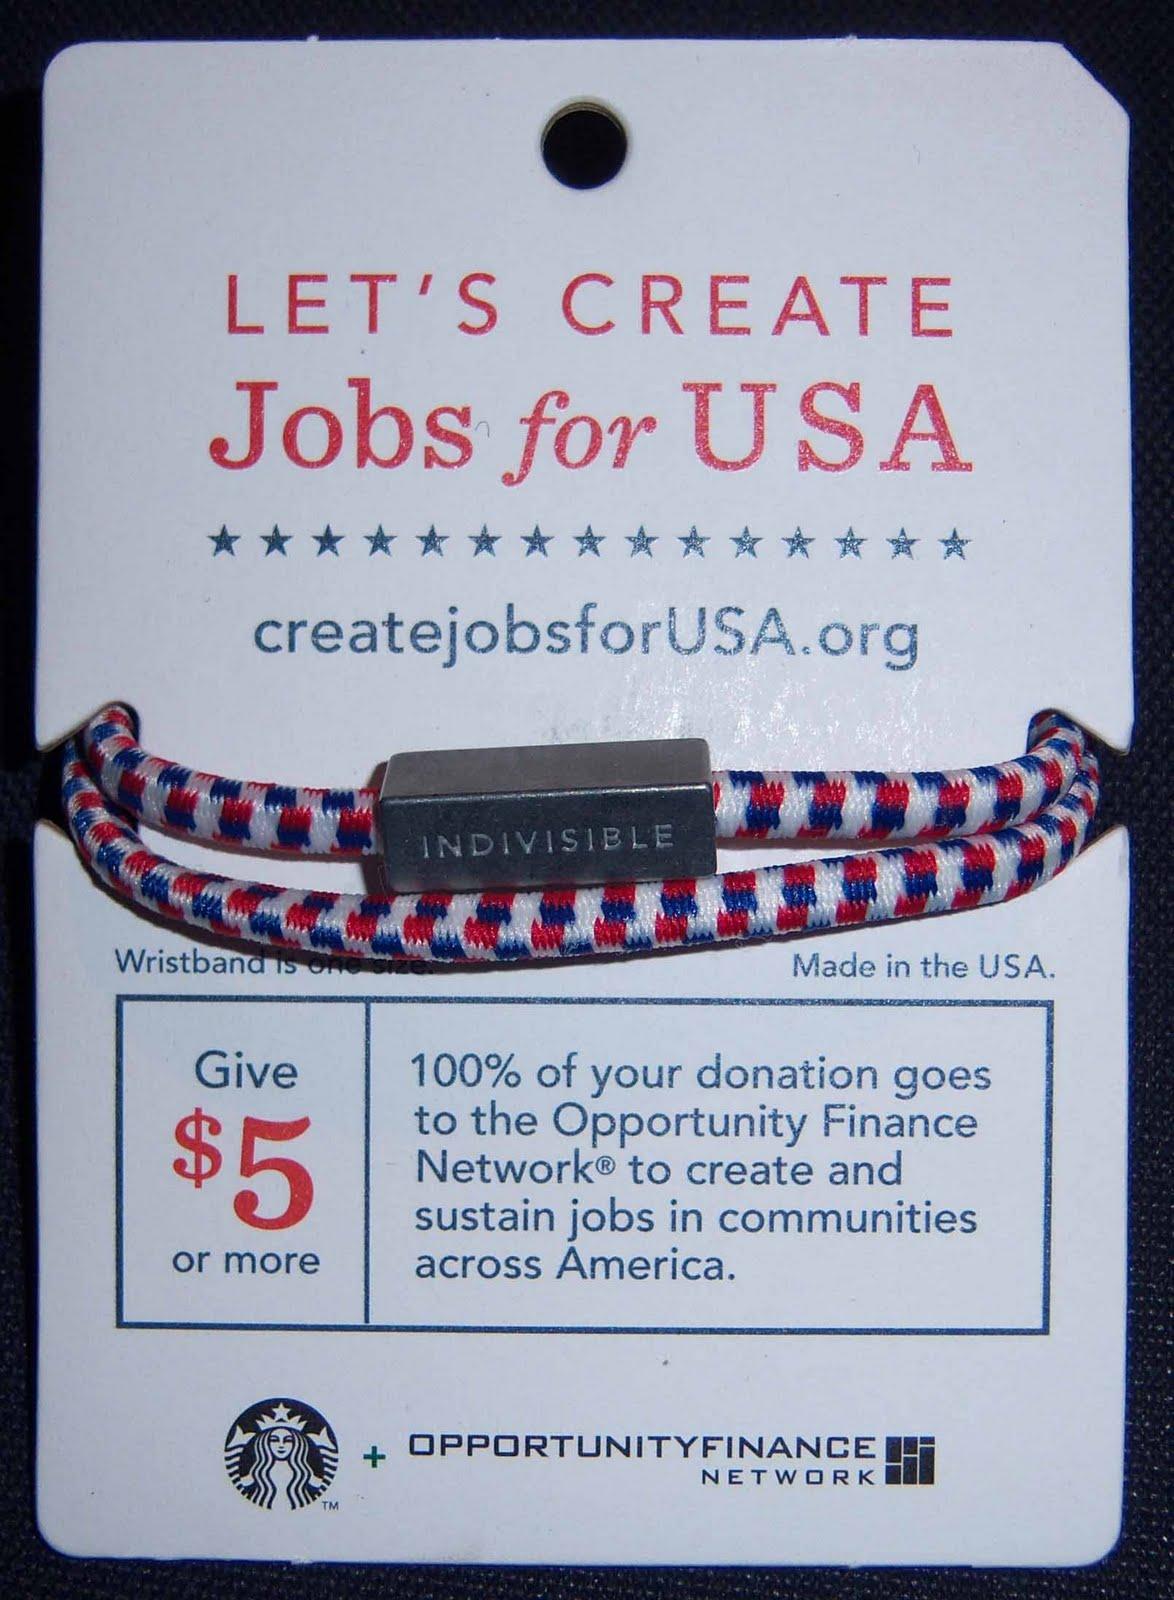 http://4.bp.blogspot.com/-LFzg-DEj7WI/TwpqYcLyvaI/AAAAAAAACEg/MBU6HSkIwvA/s1600/Starbucks%2BIndivisible%2Bwristband%2BOpportunity%2BFinance%2BNetwork%2BSandy%2BUtah%2BQuarry%2BStarbacks%2Bfront%2Bcirca%2BDec%2B2011.jpg